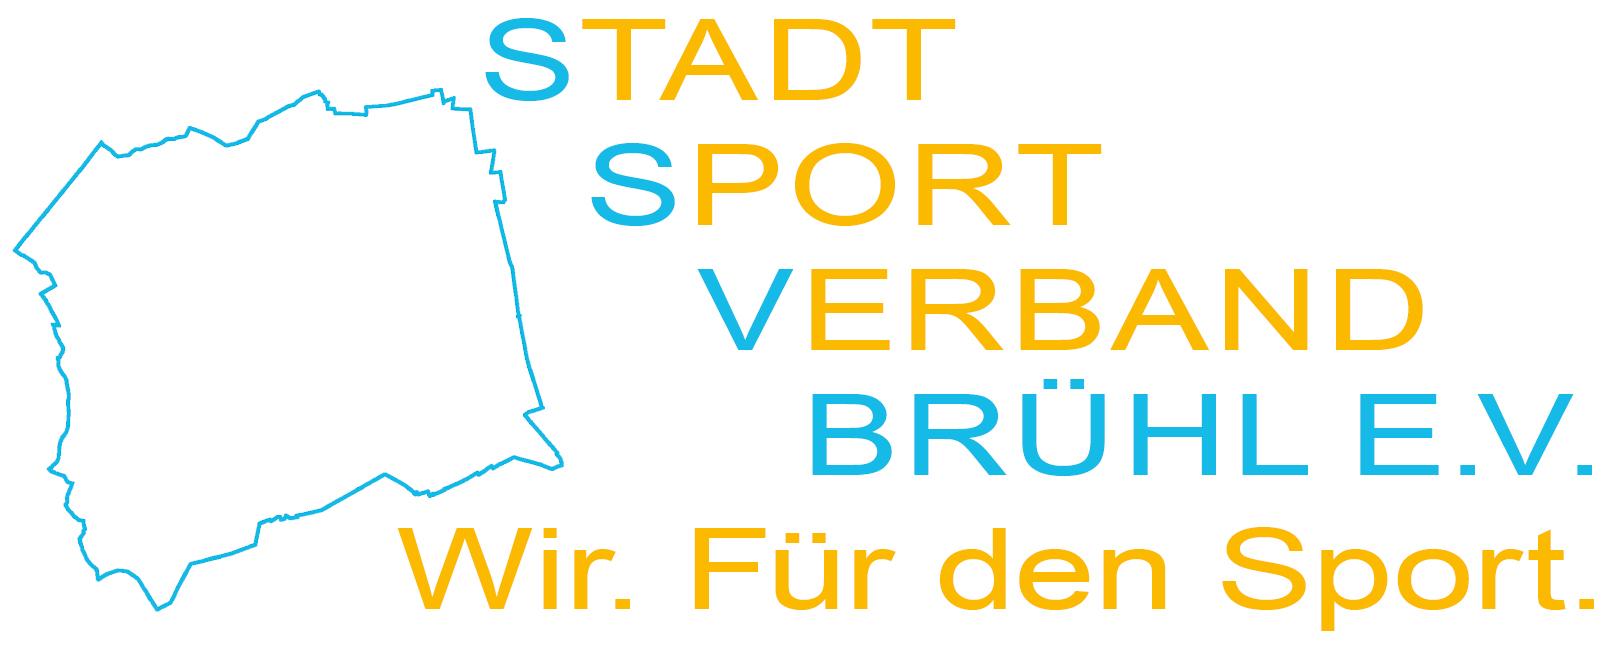 Stadtsportverband Brühl e.V.